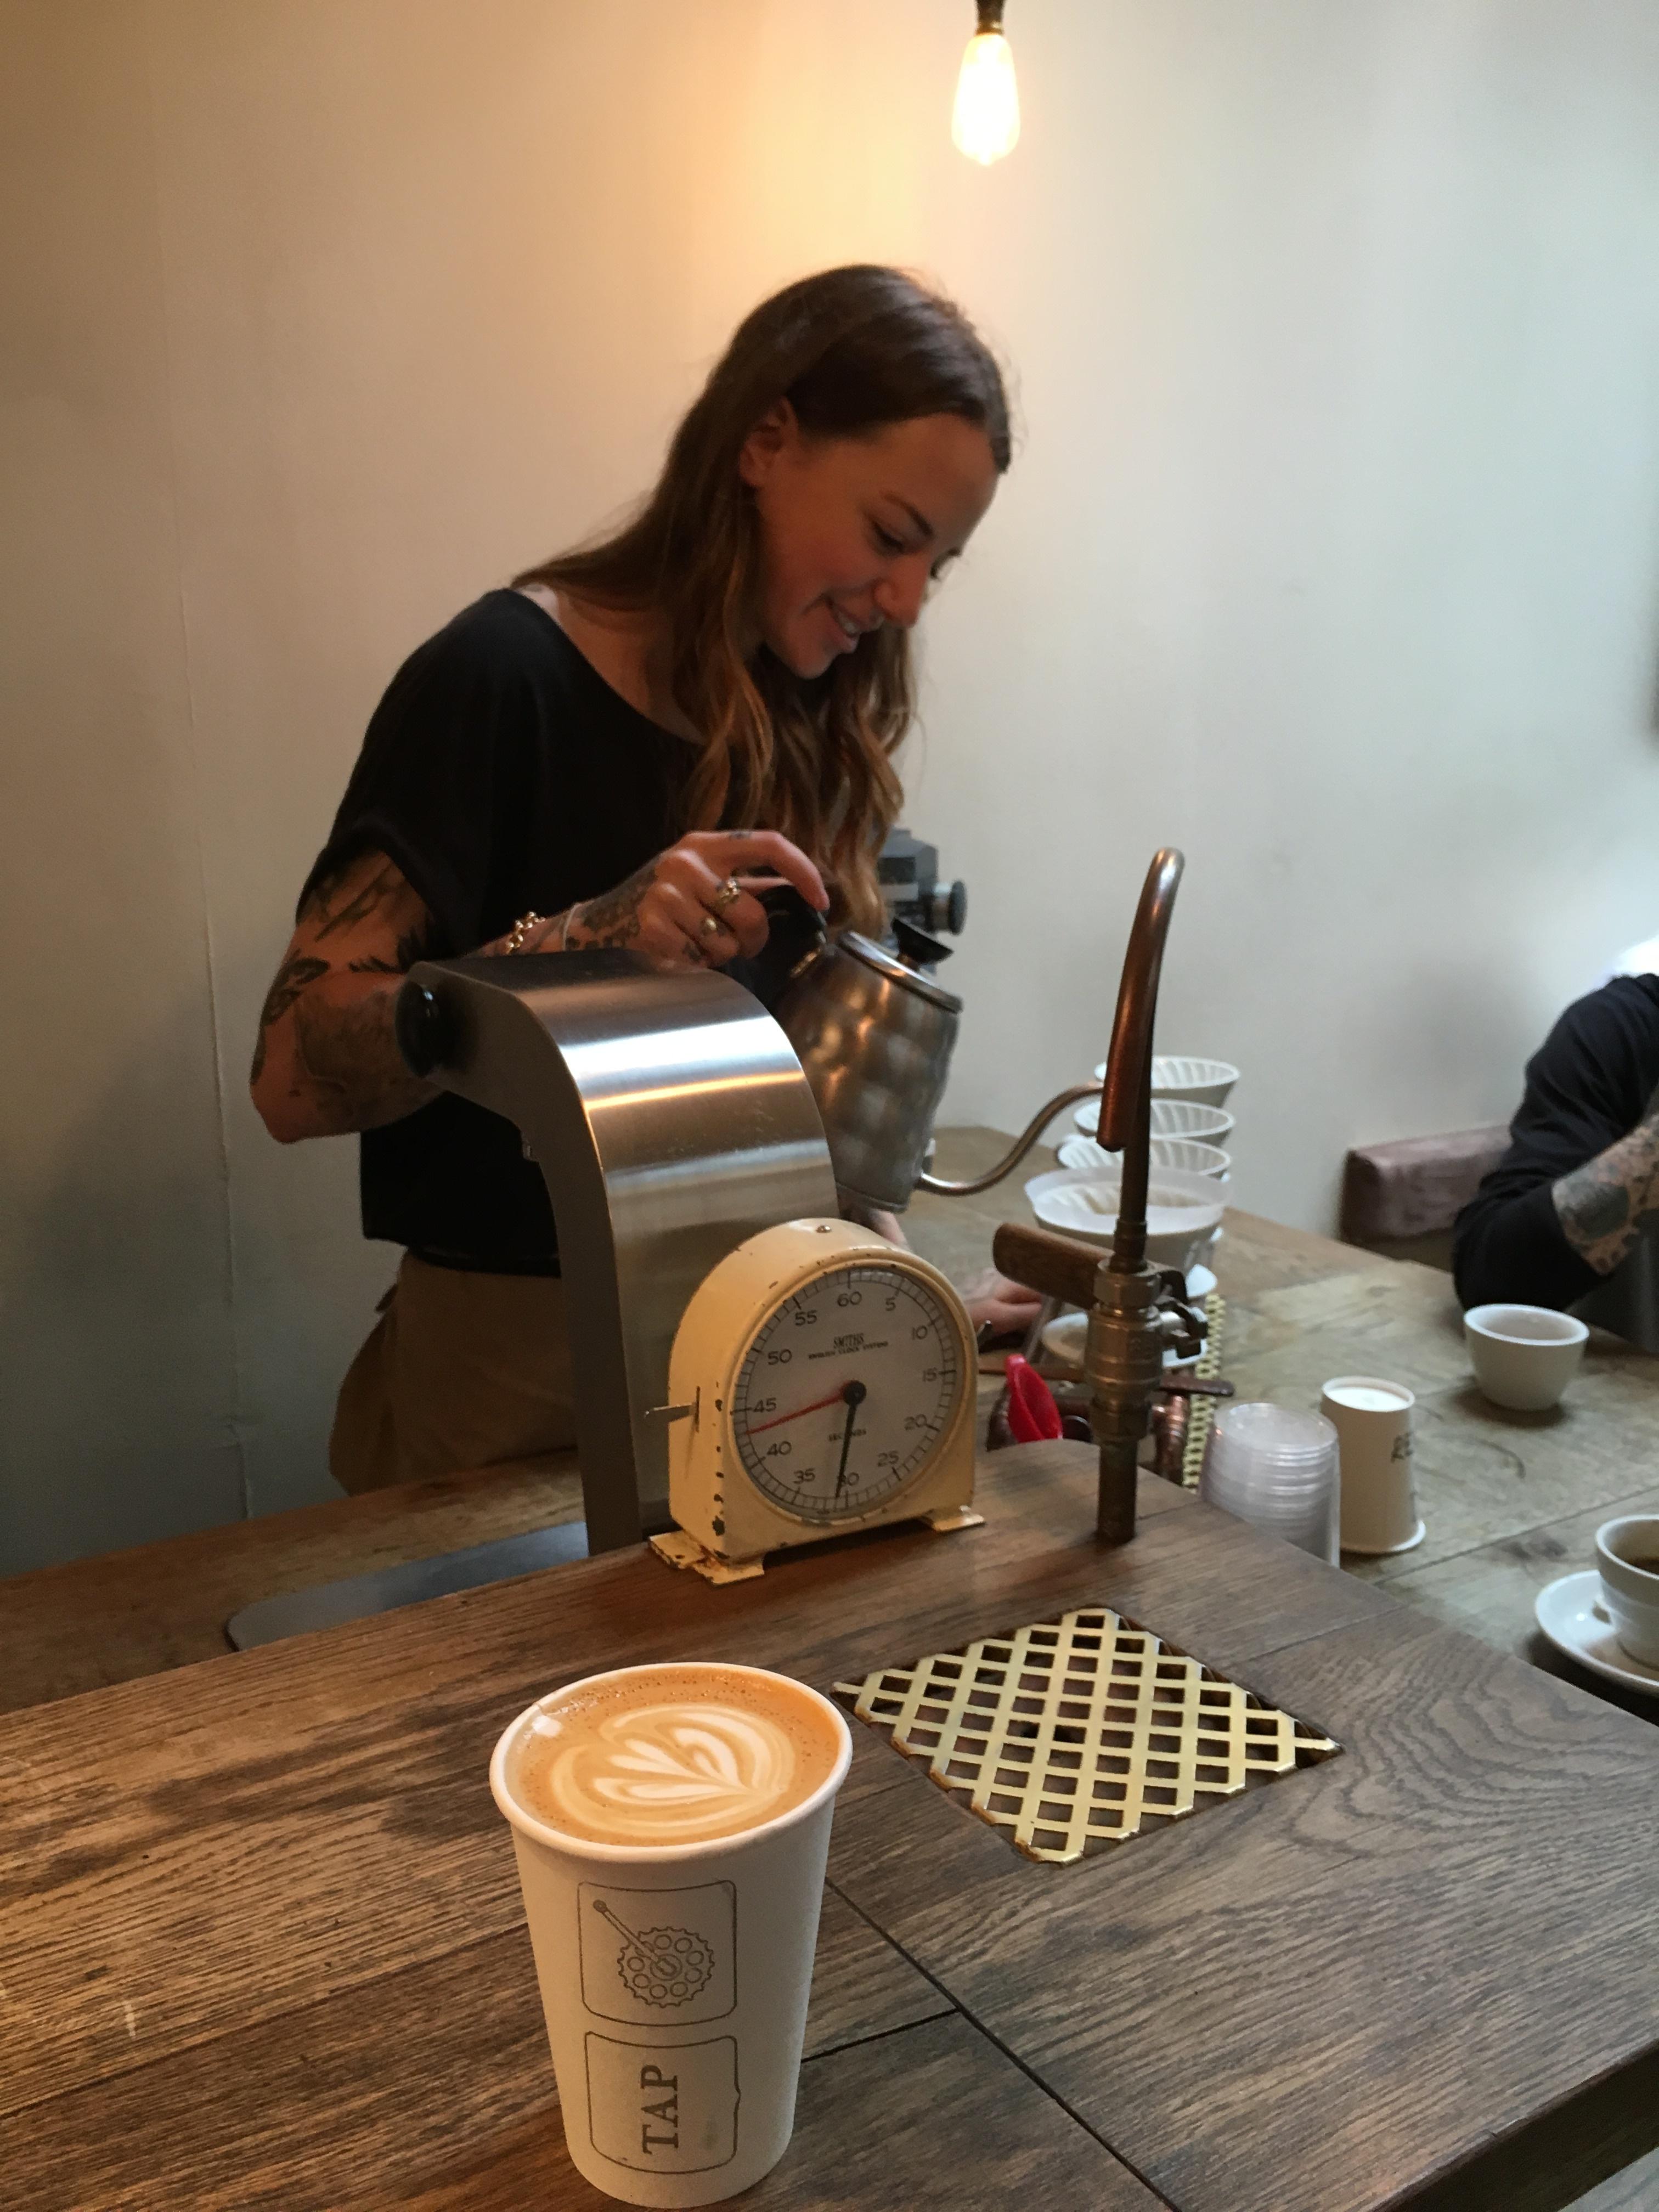 @London コーヒー屋さん_1_2-1